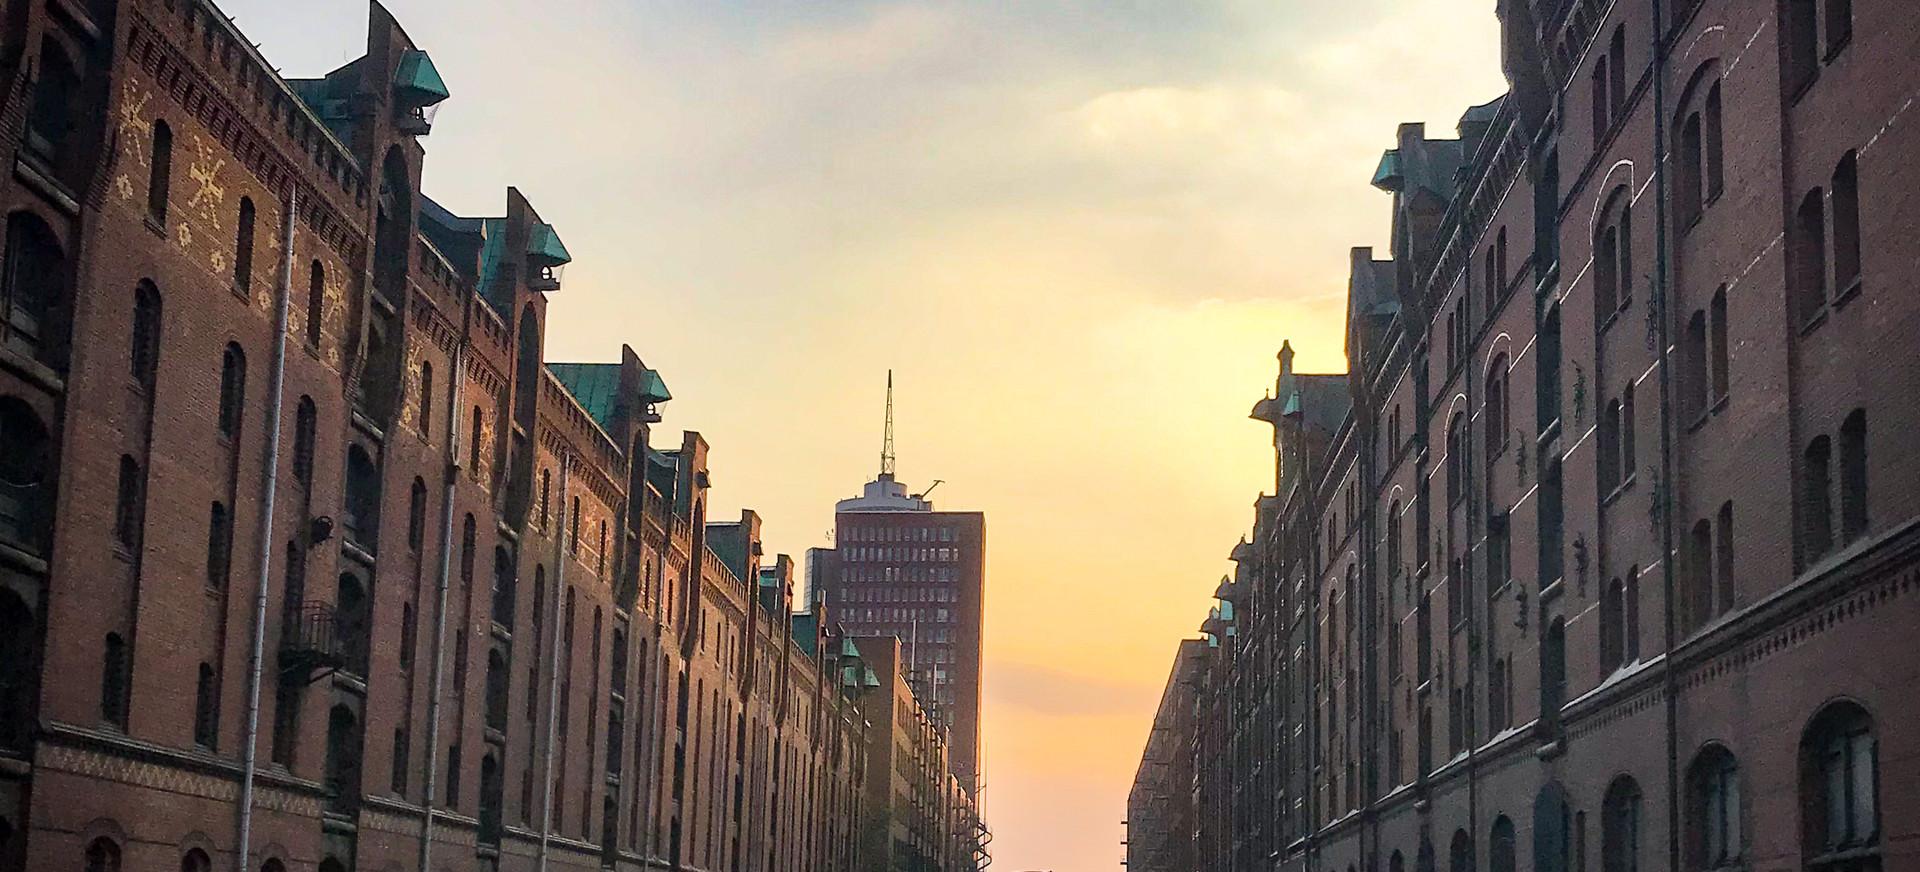 Hamburg 2020 Architectural Shoot